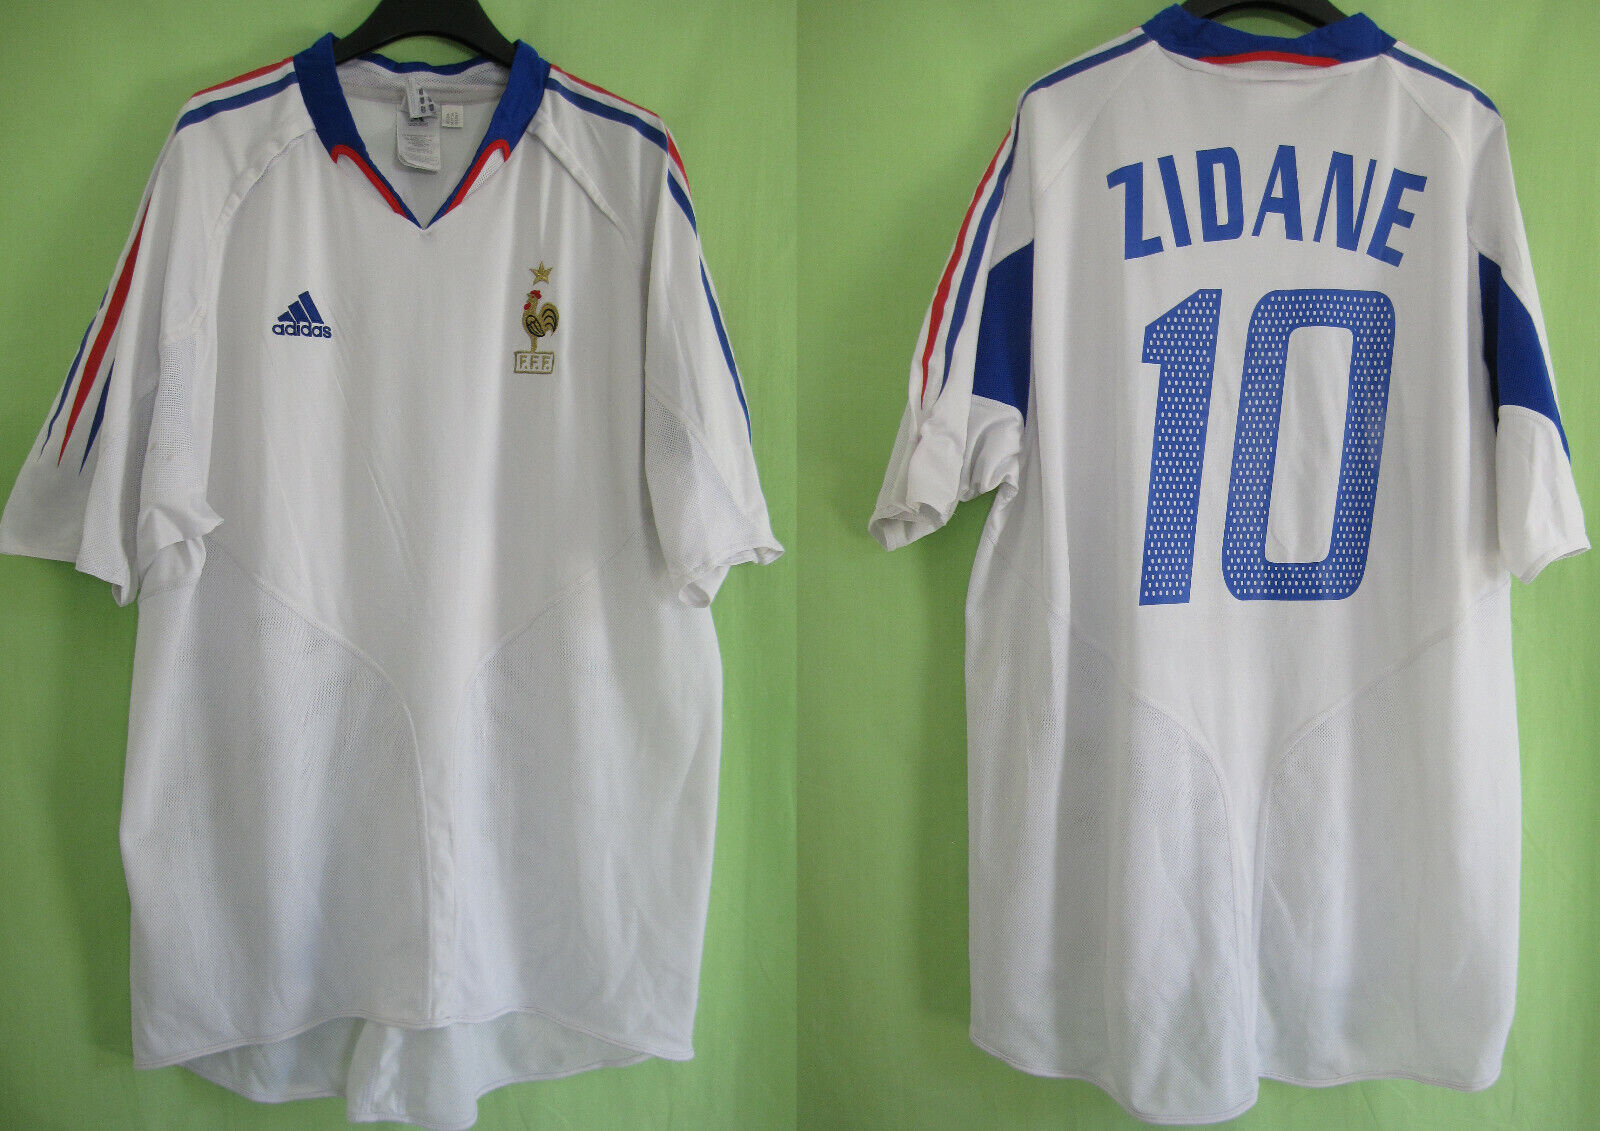 Maillot Equipe de France 2004 Away Zidane  10 Vintage Adidas Jersey  XXL